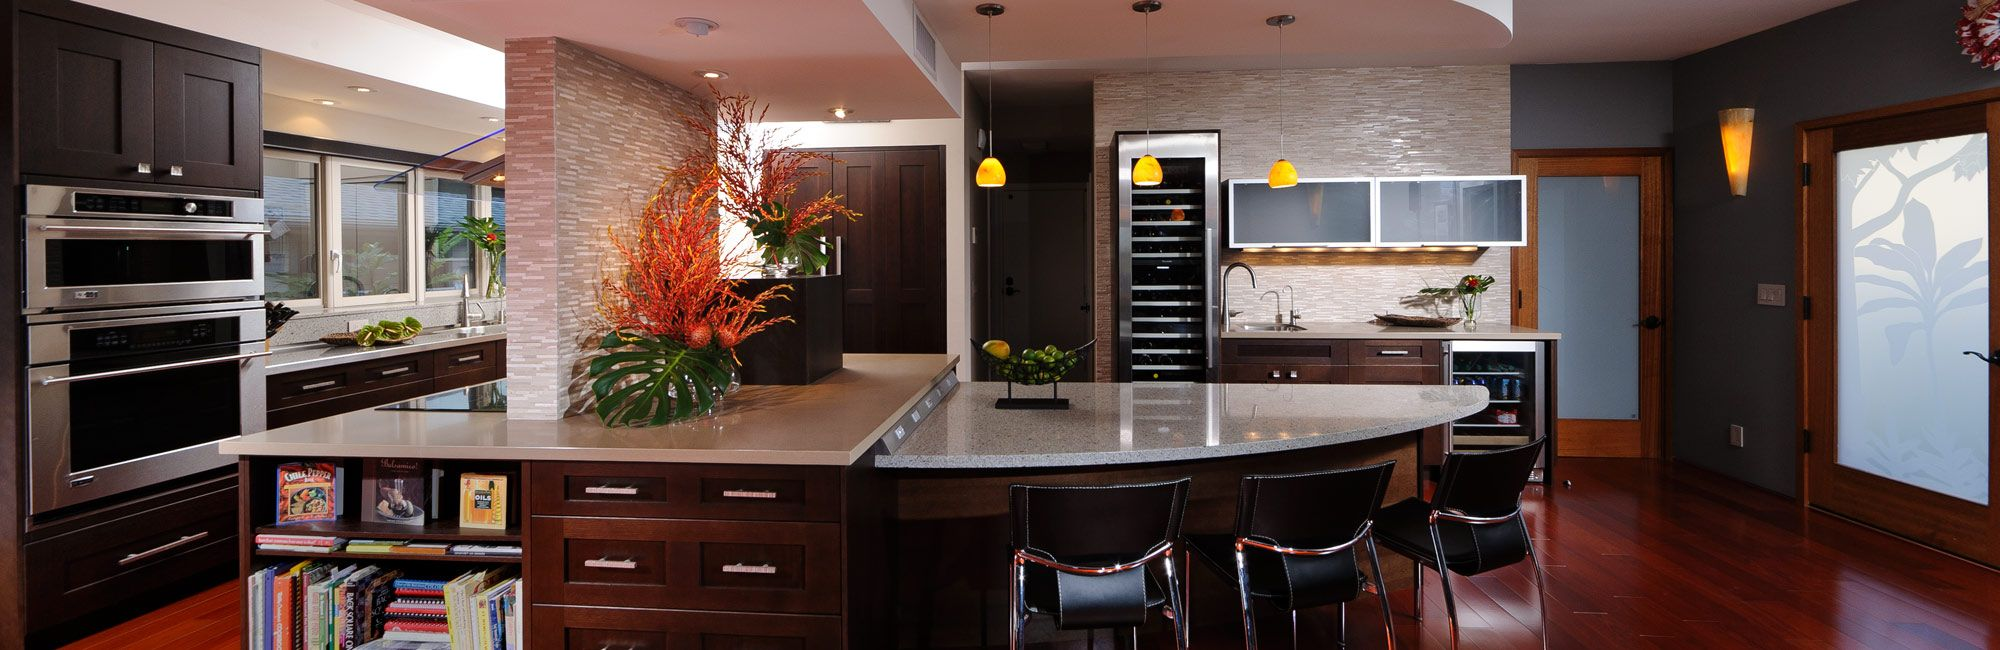 columbia cabinets rh columbiacabinets com columbia kitchen cabinets jobs columbia kitchen cabinets reviews